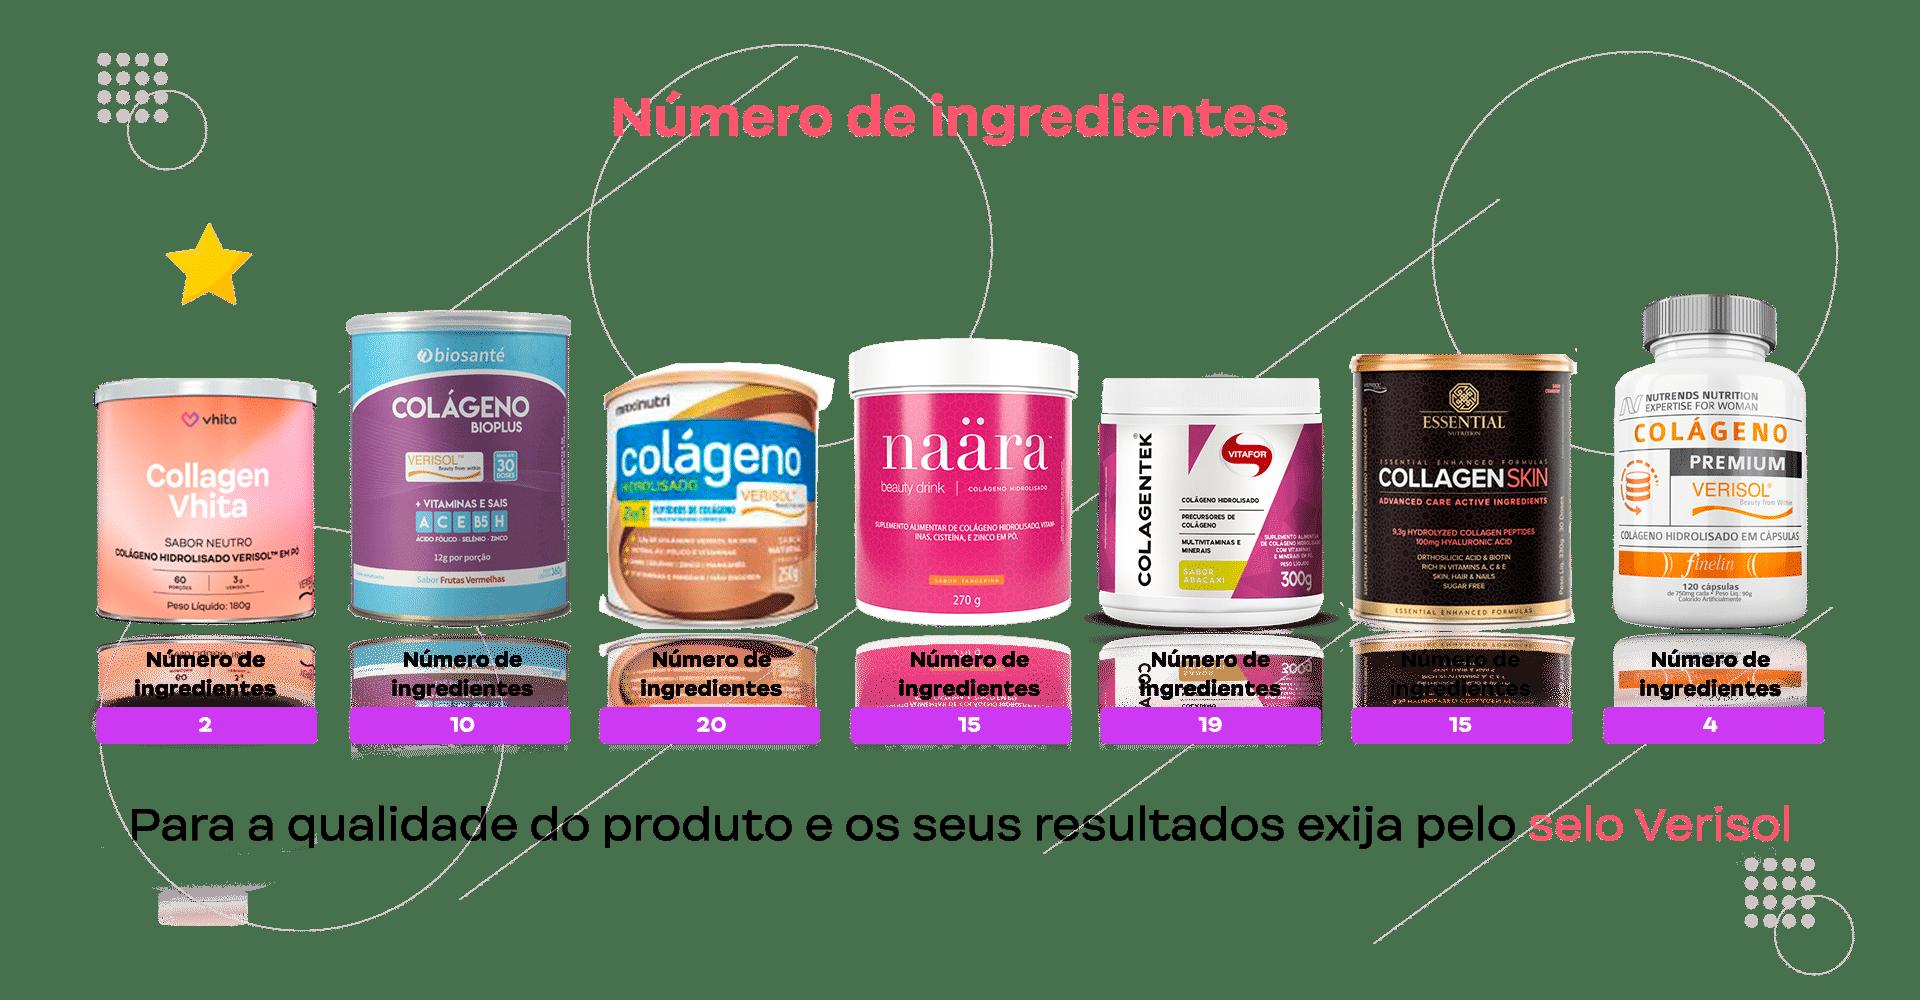 número de ingredientes das marcas de colágeno mais buscadas